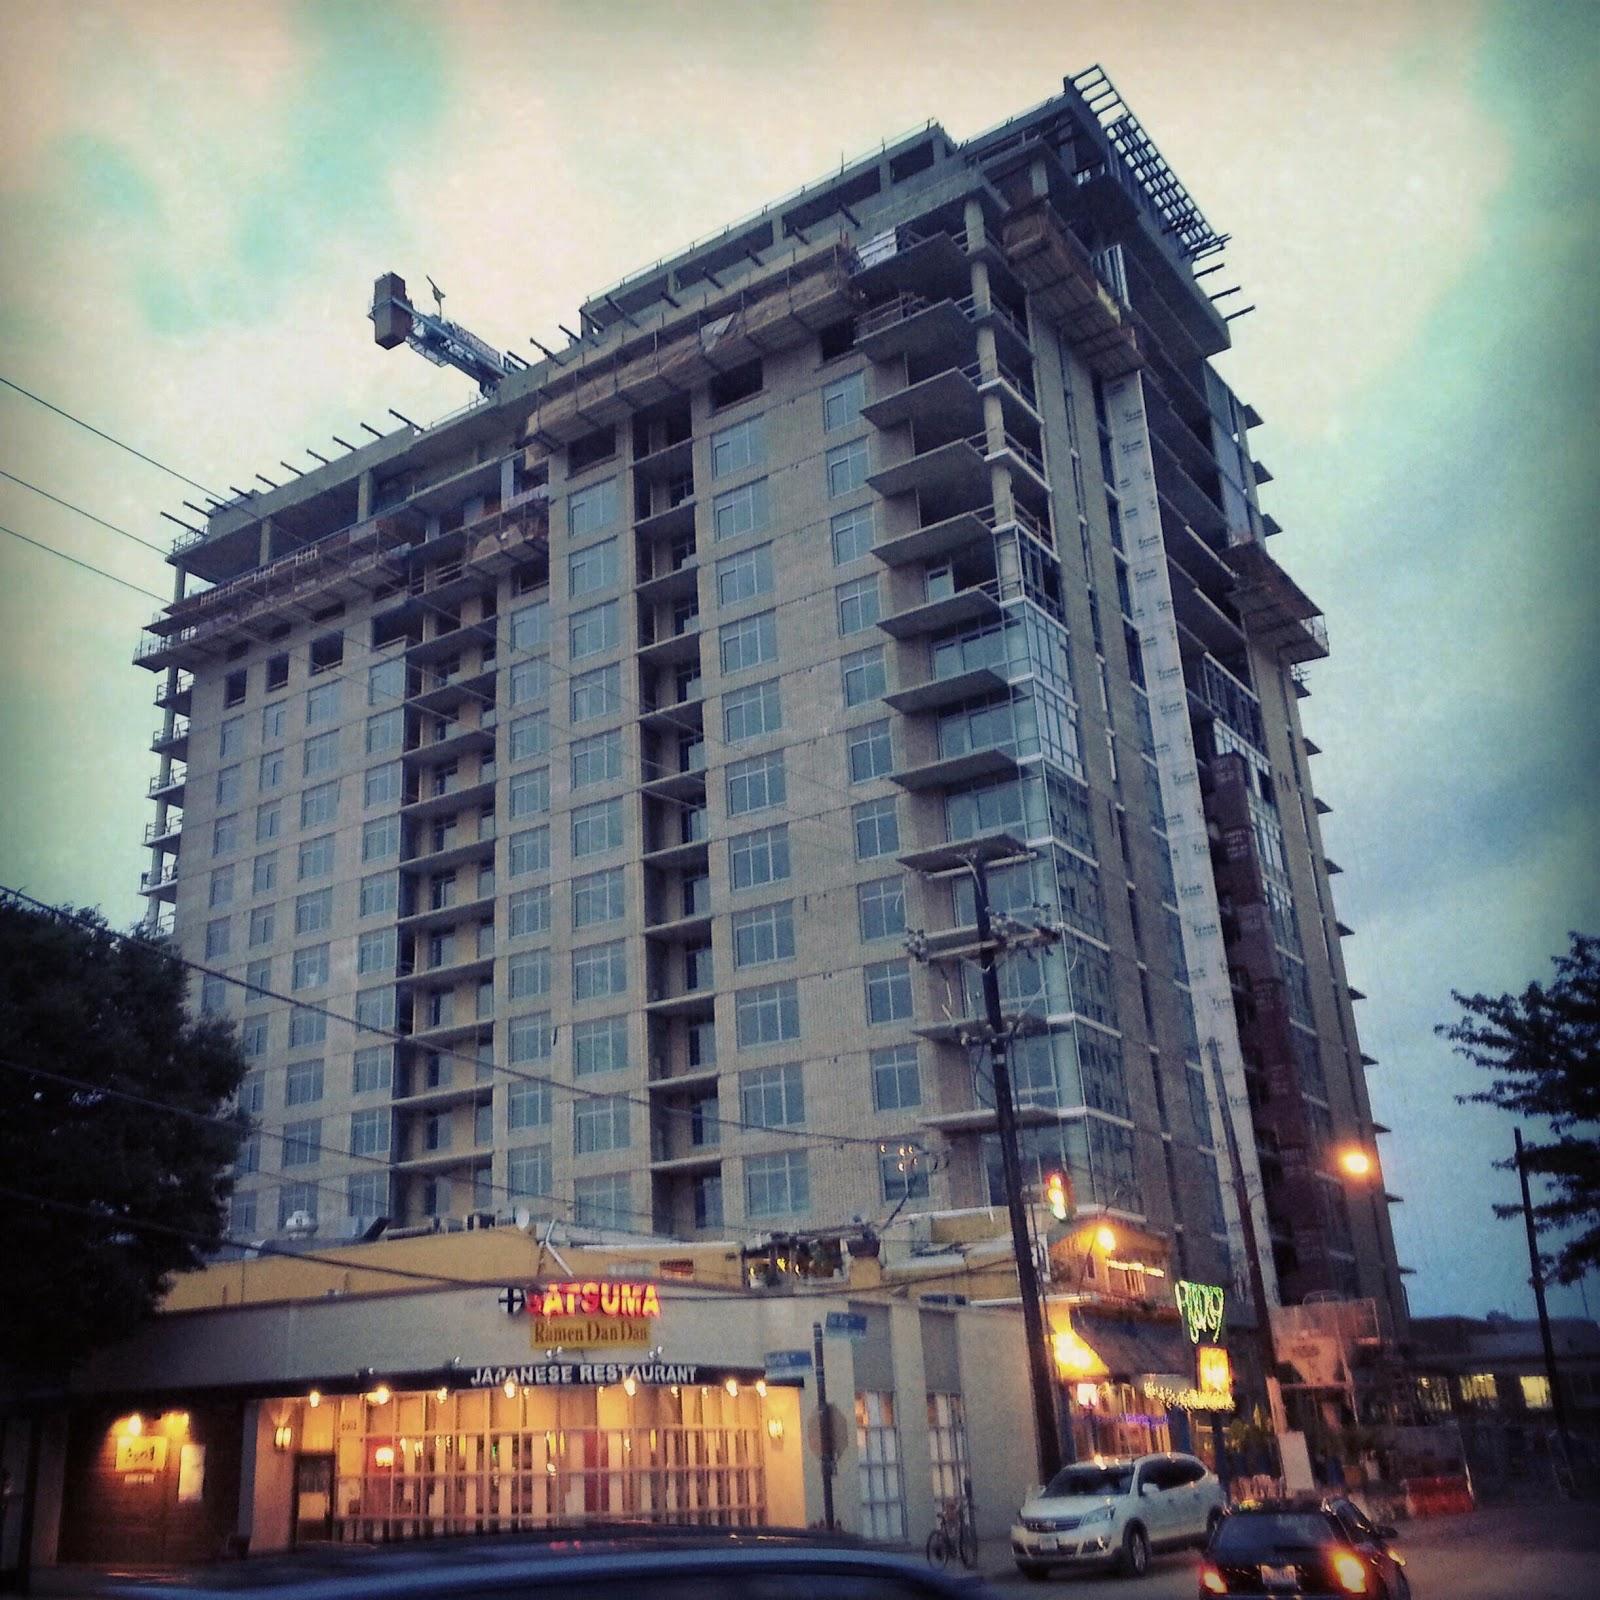 Apartments In Bethesda: Robert Dyer @ Bethesda Row: GALLERY BETHESDA LUXURY